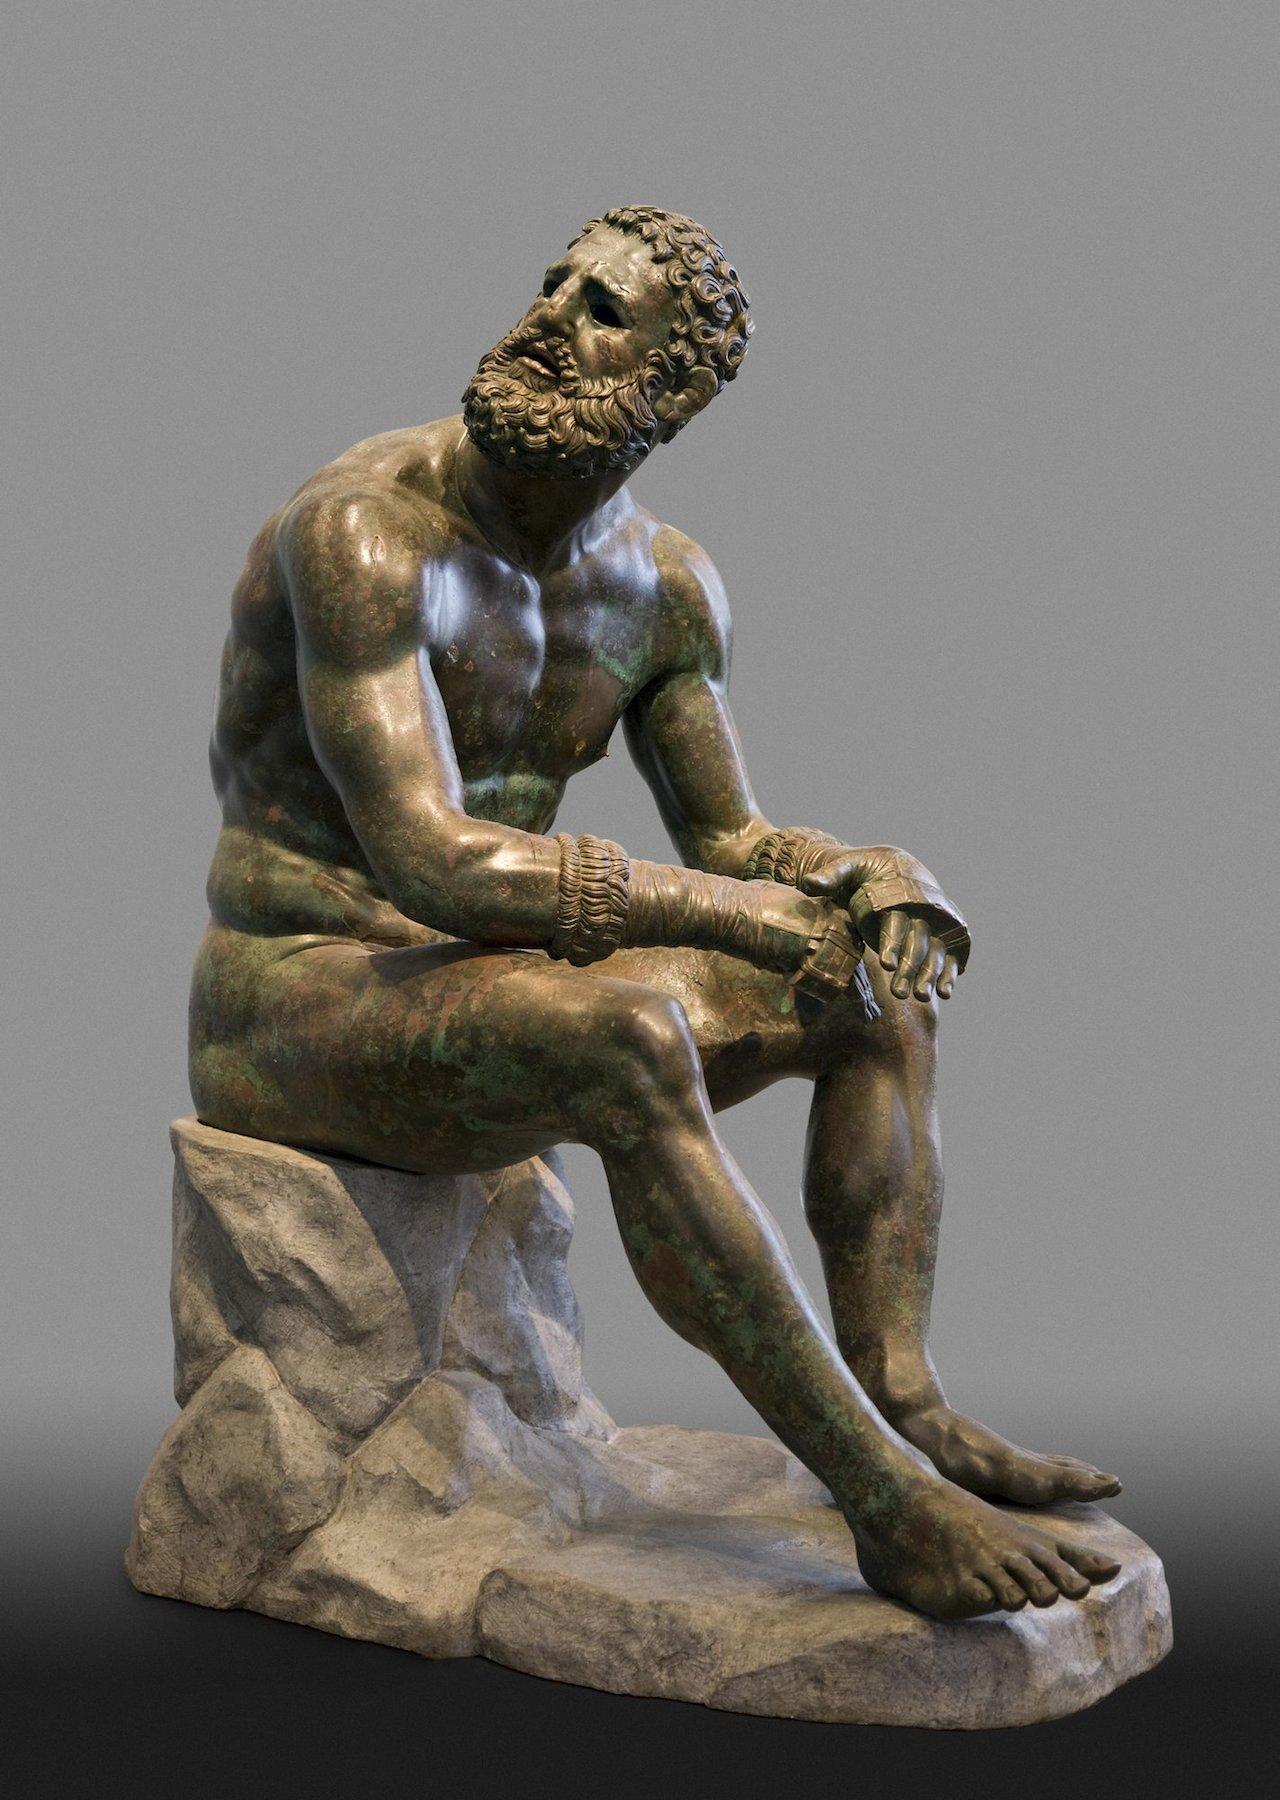 Terme Boxer (3rd-2nd century BCE), Greek bronze (courtesy Museo Nazionale Romano - Palazzo Massimo alle Terme)